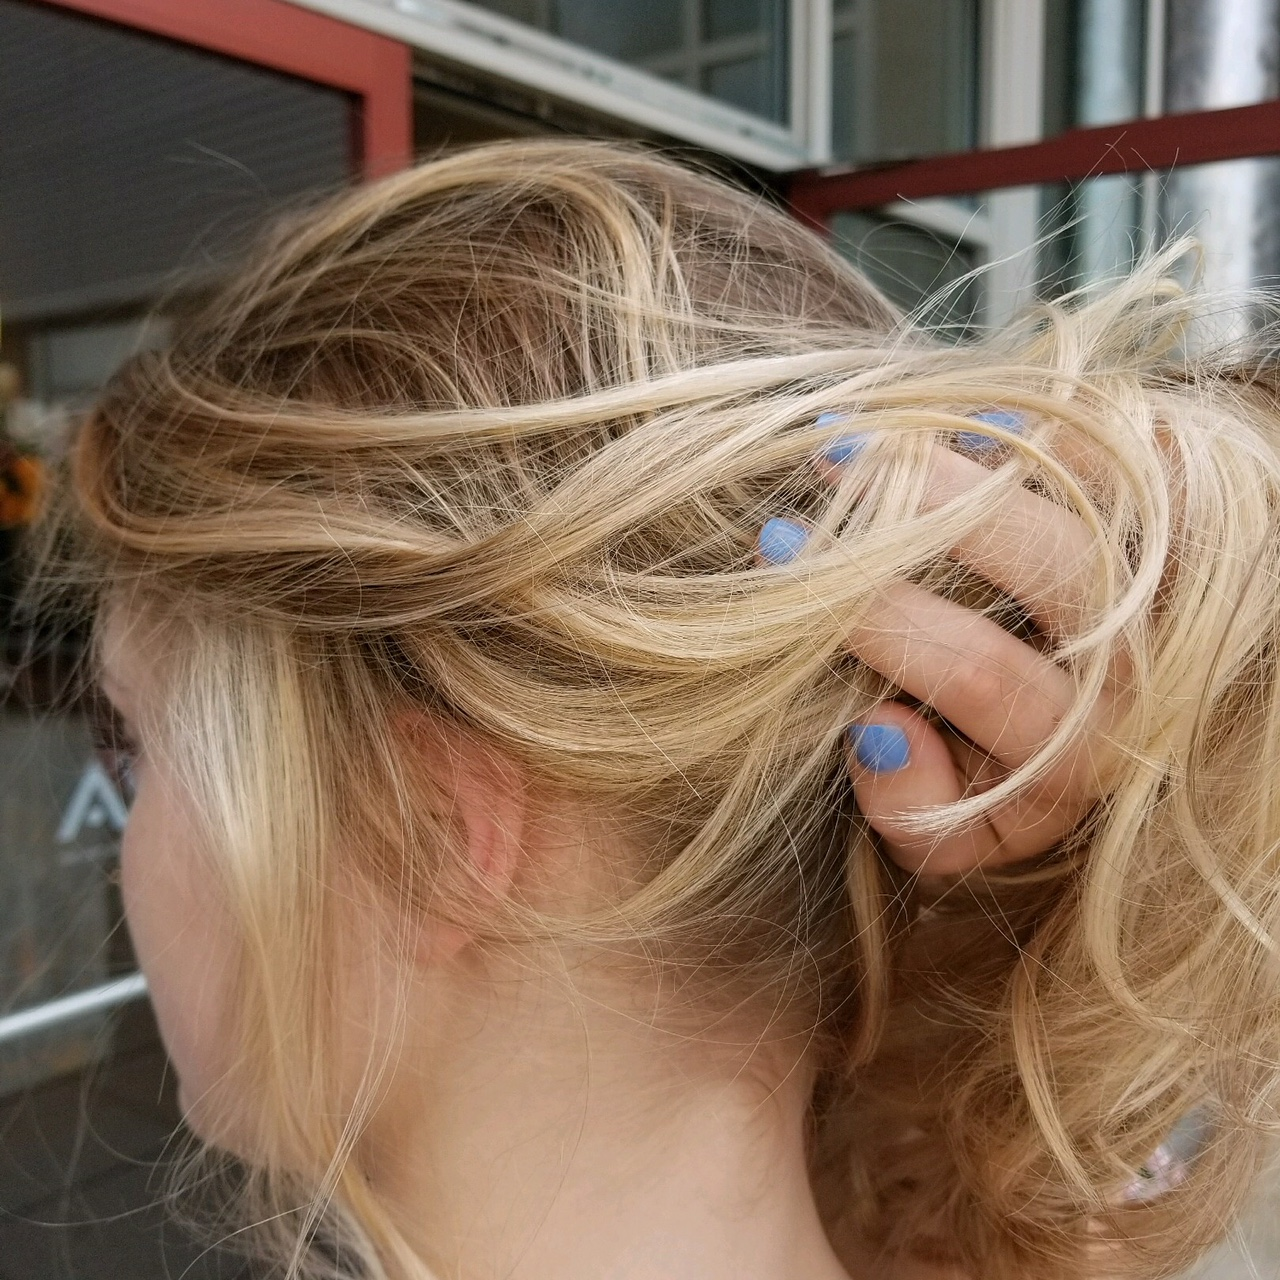 HAIR COLOUR STUDIO - STYLE 10560